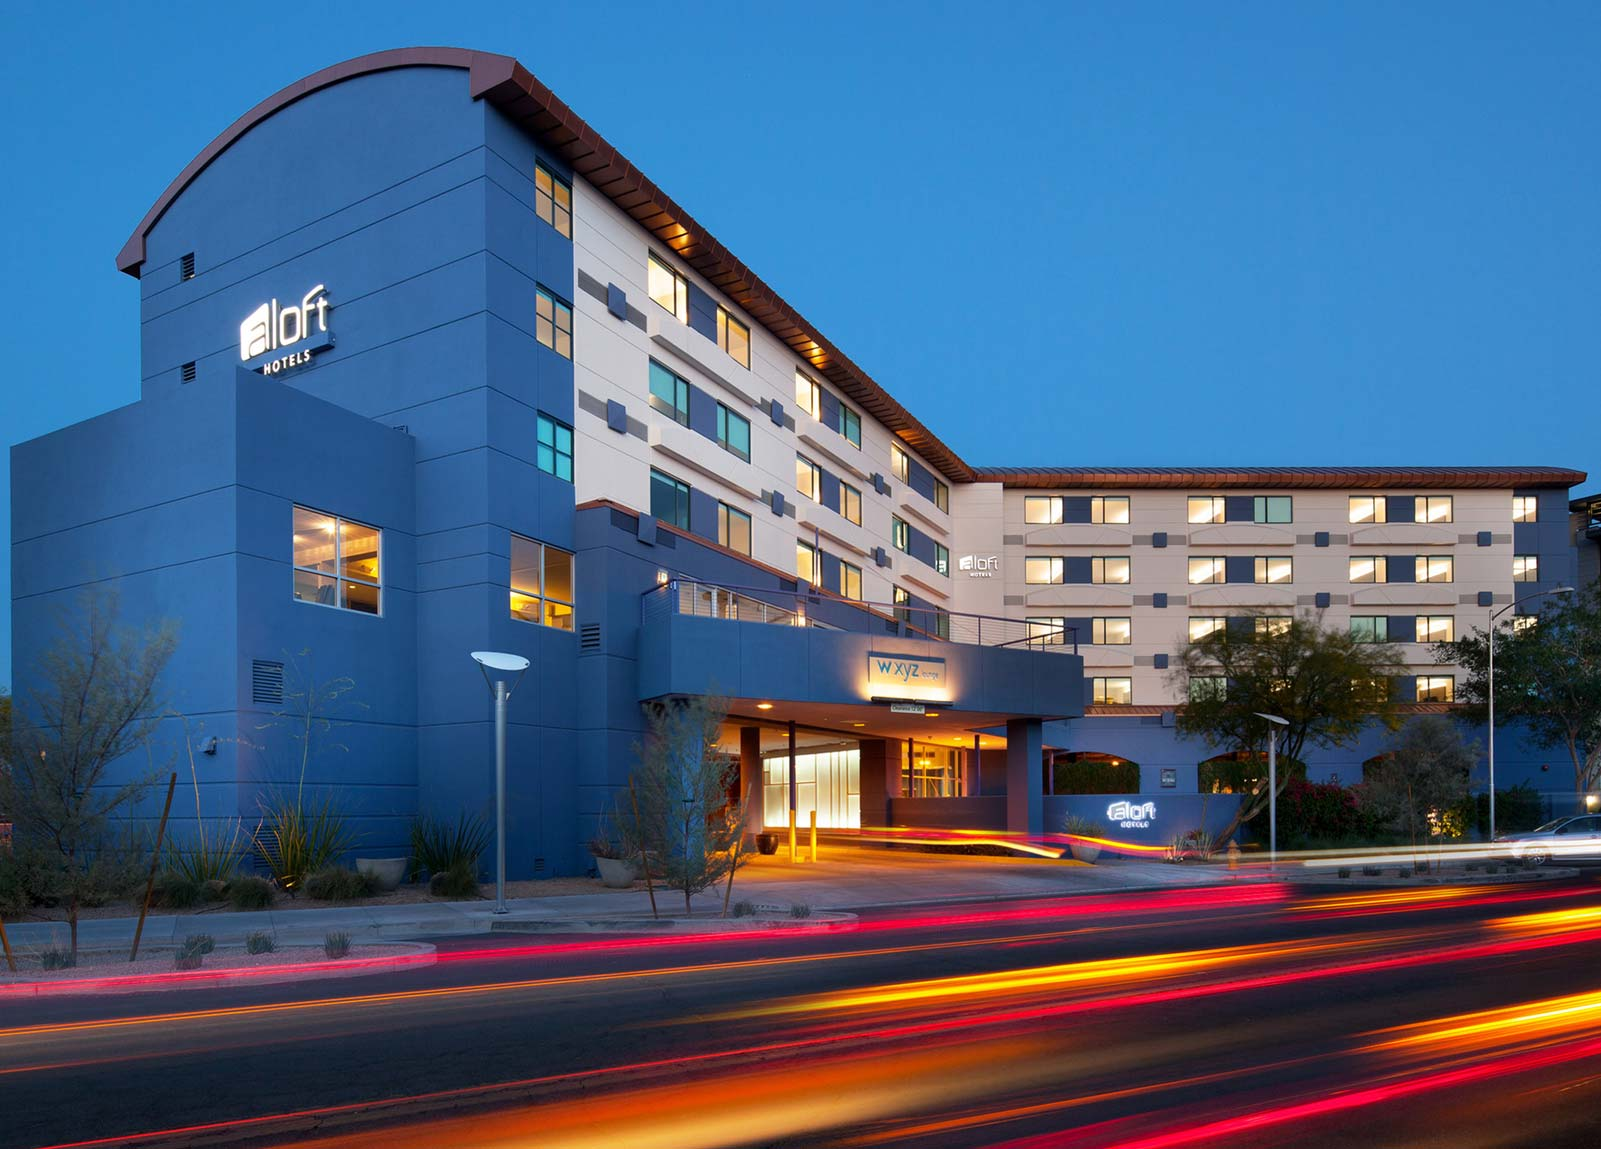 Aloft Scottsdale